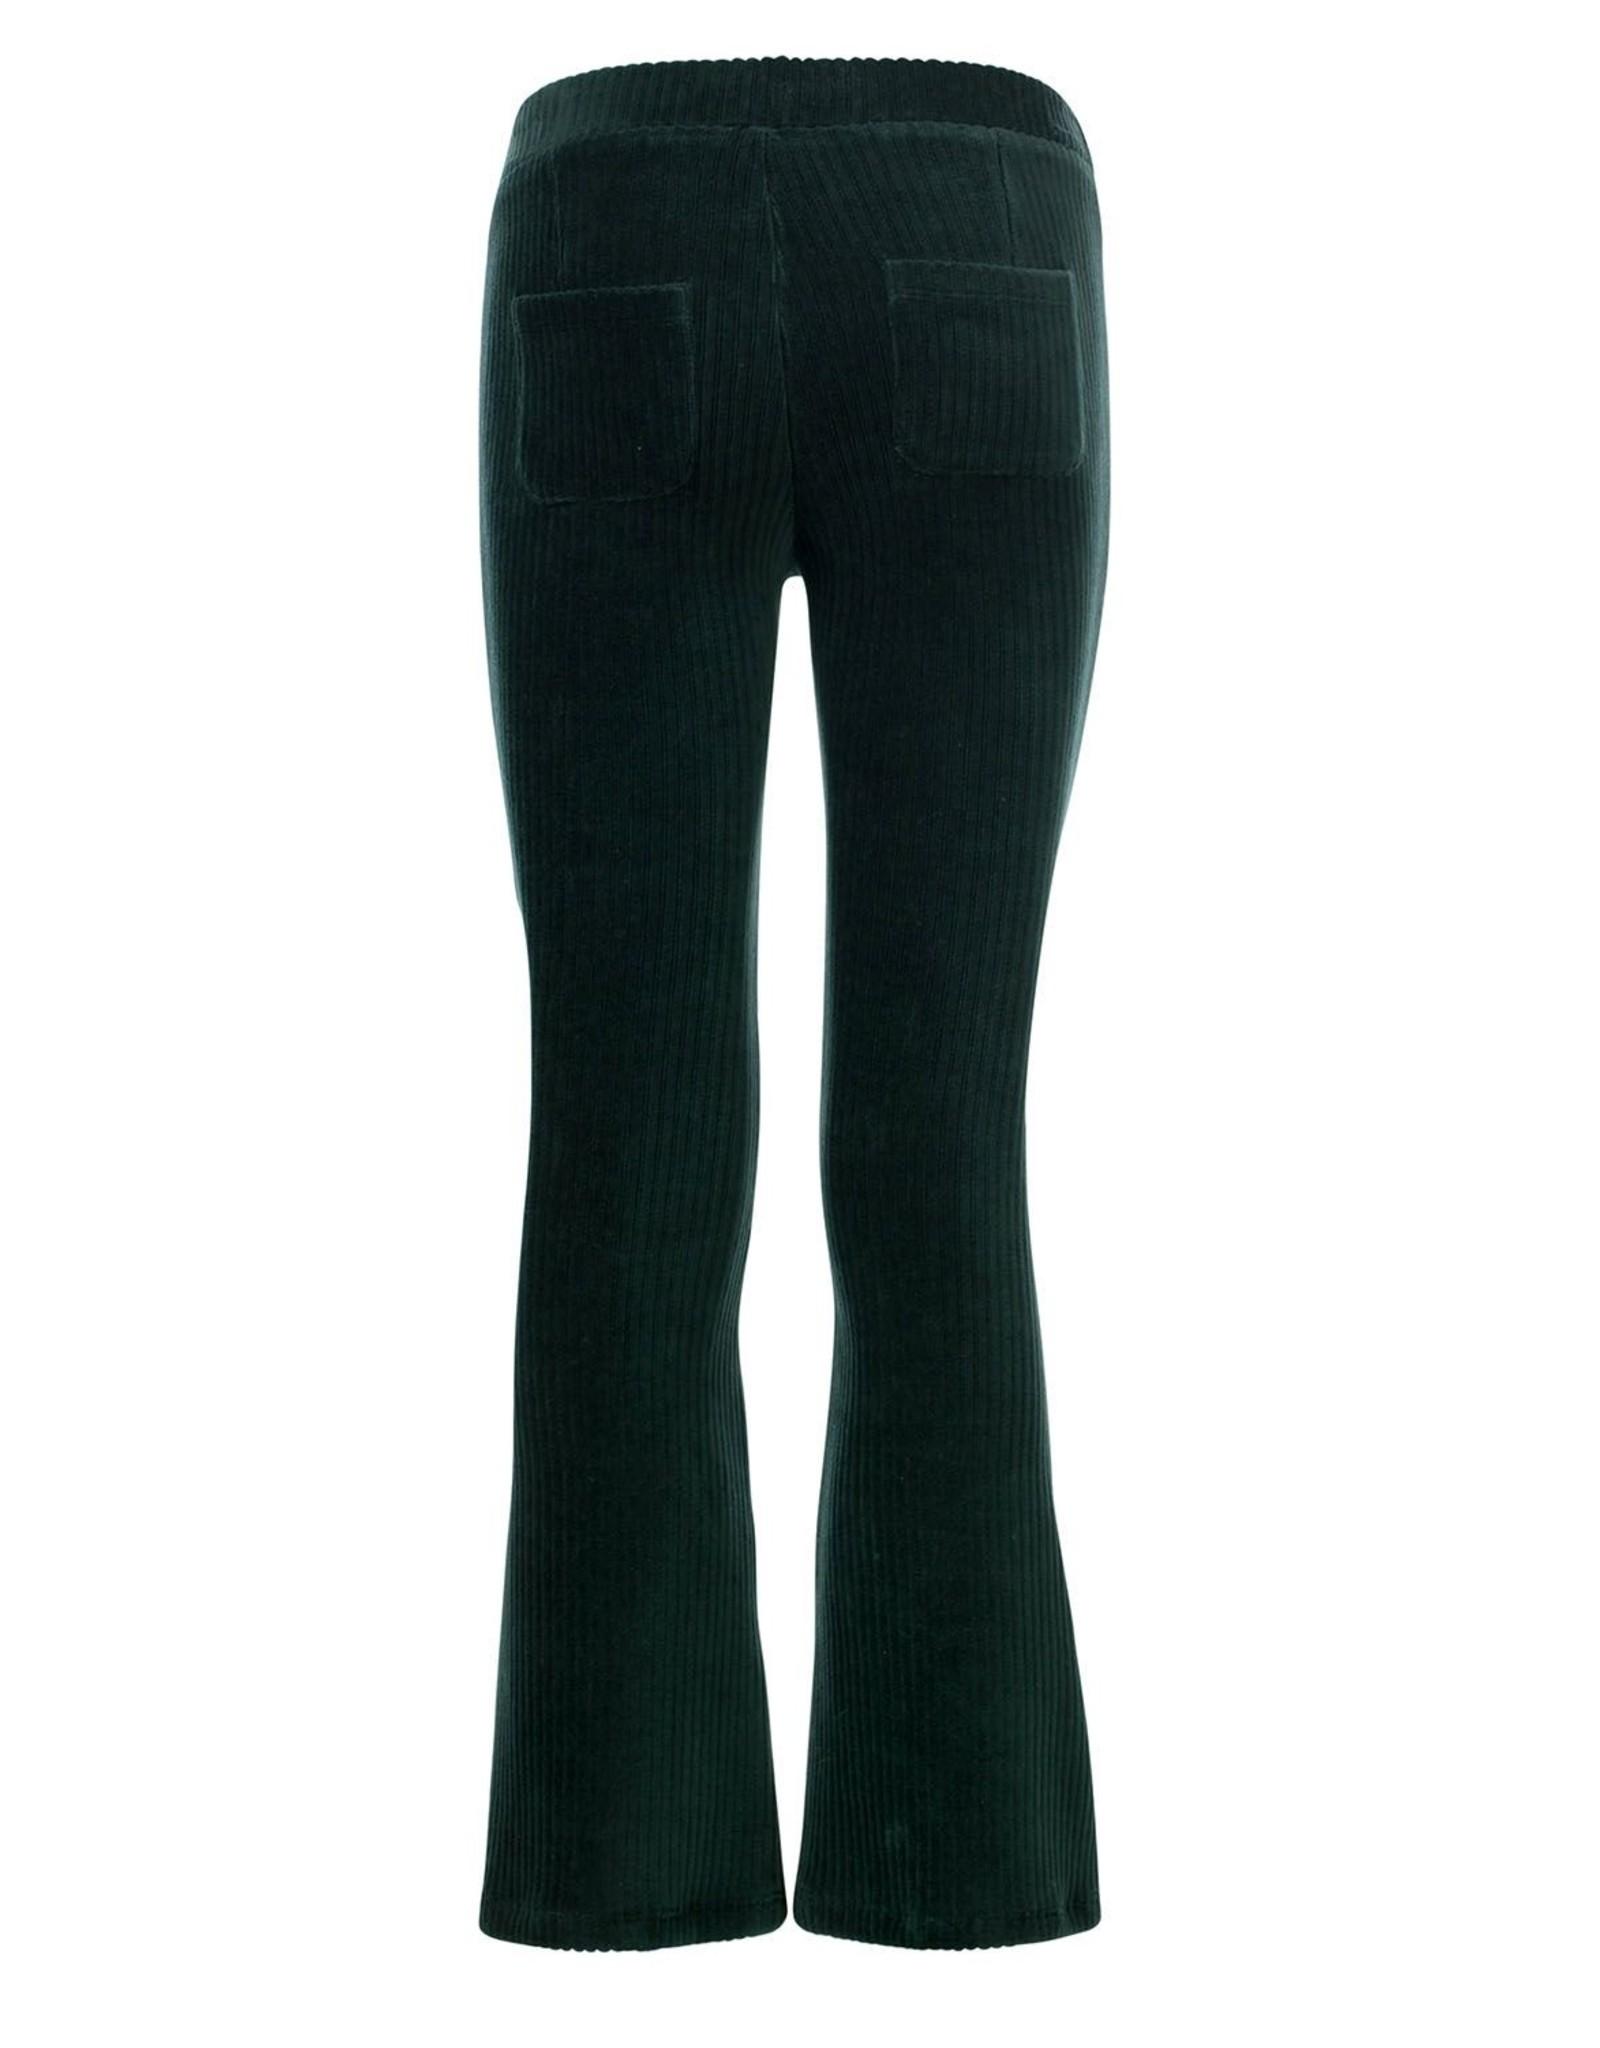 looxs 2132-7667 Pants